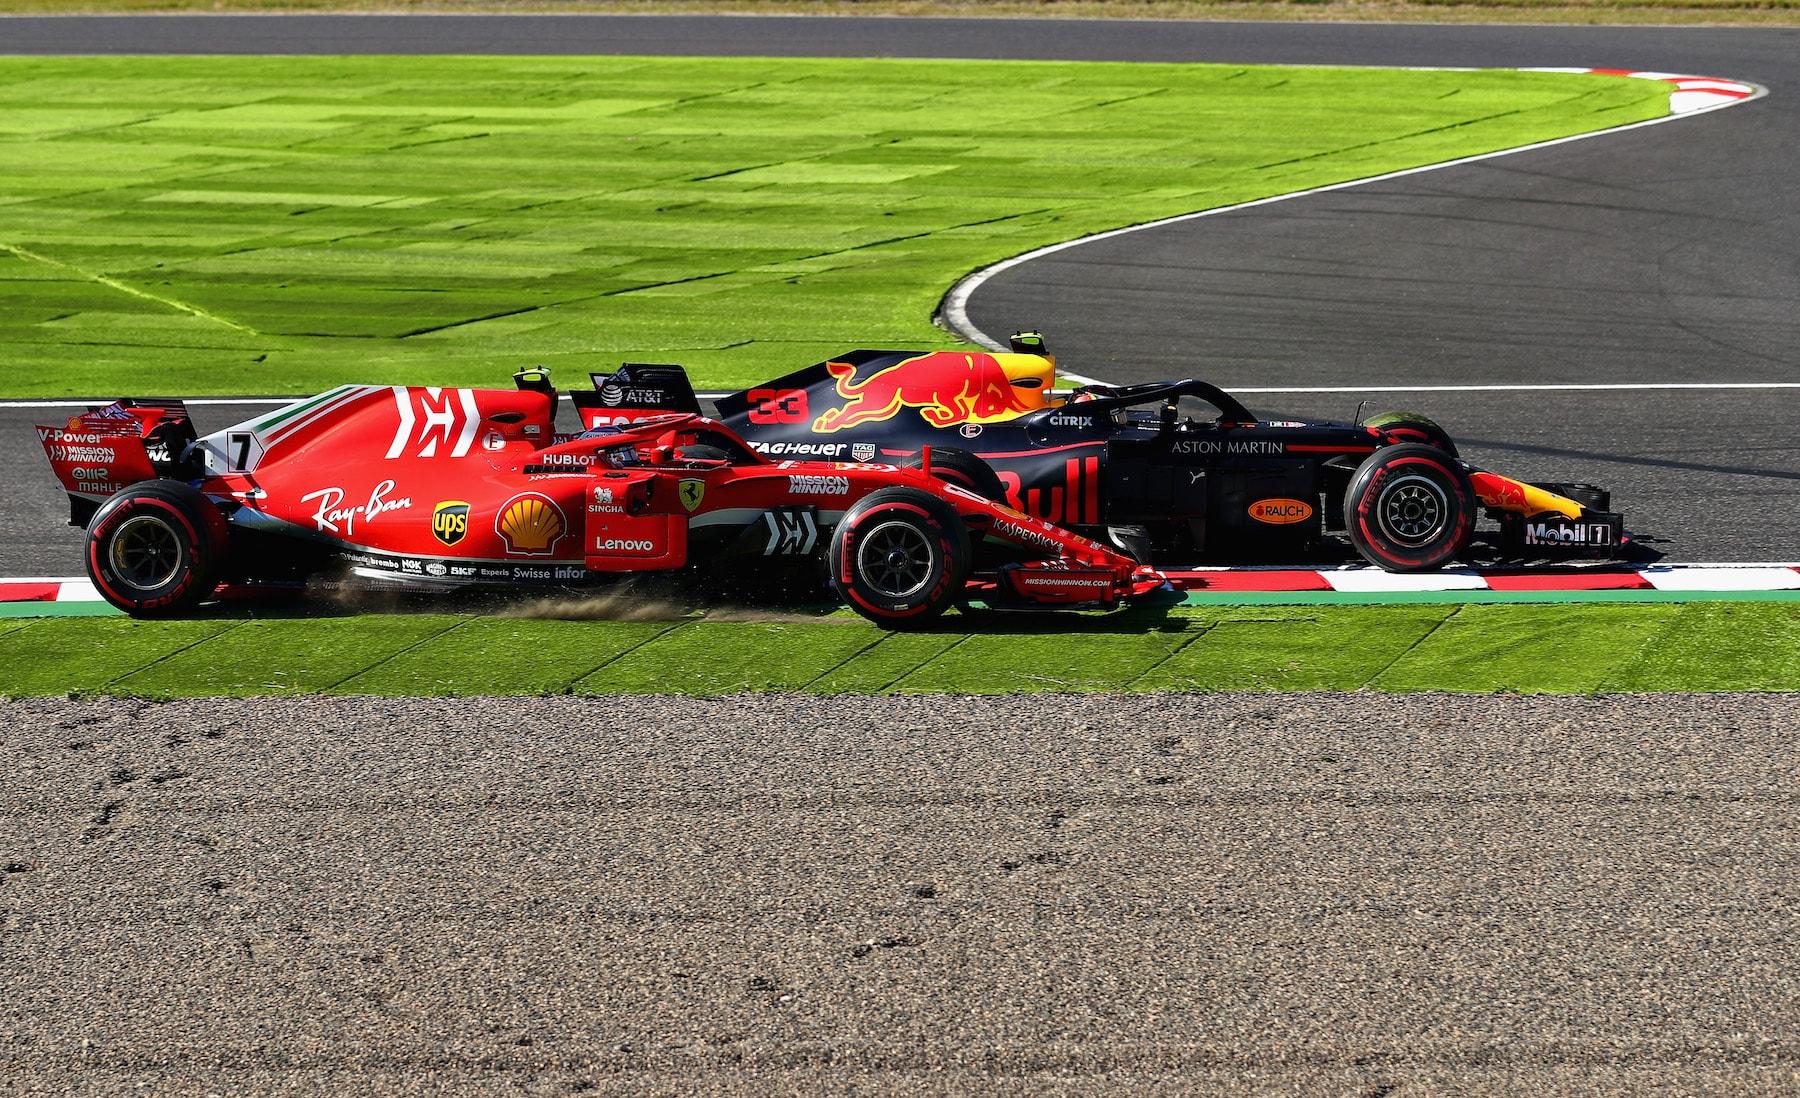 F 2018 Kimi Raikkonen and Max Verstappen | 2018 Japanese GP 2 copy.jpg